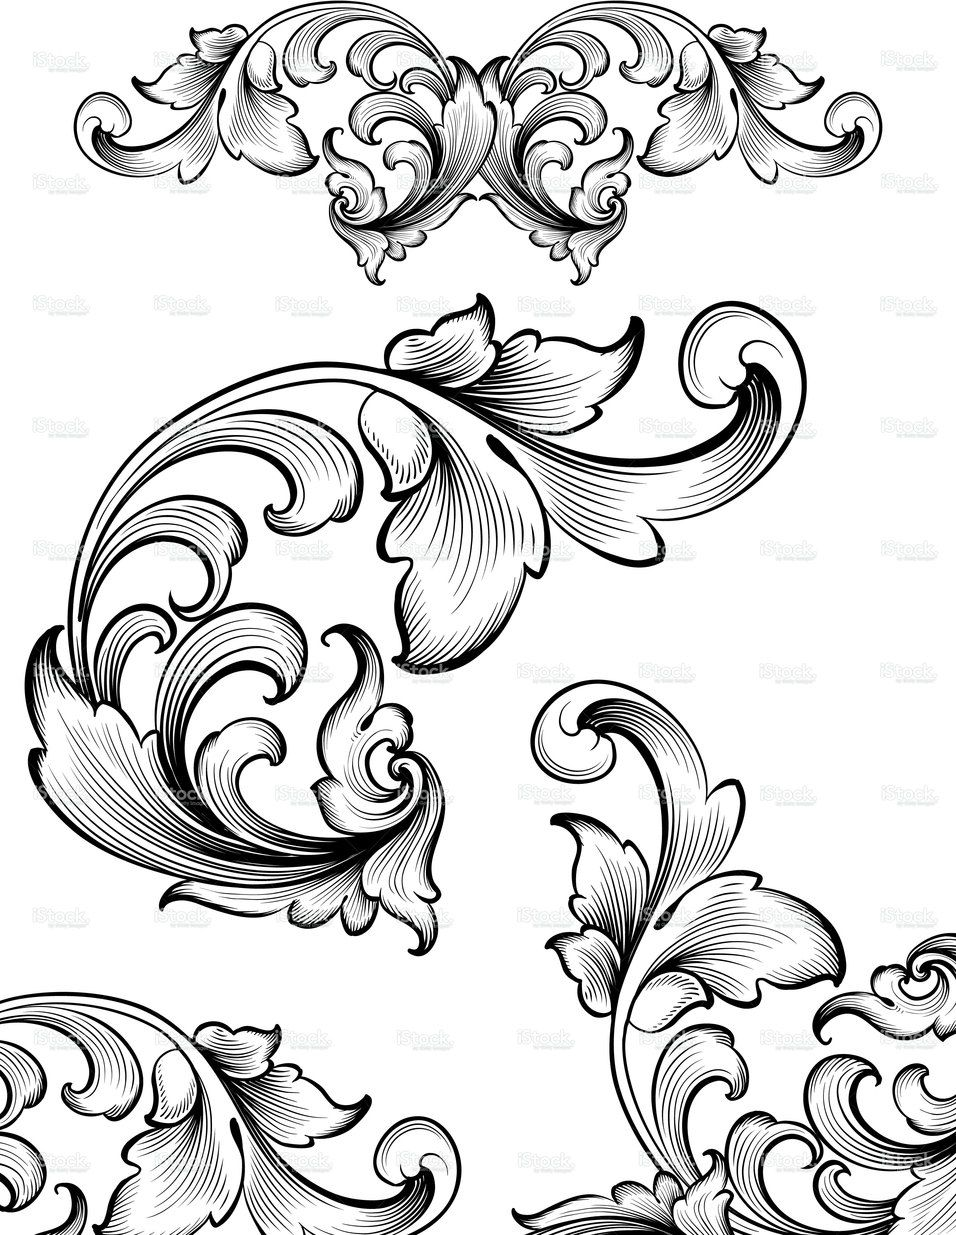 Designed By A Hand Engraver Ornate And Intricate Engraving Designs Kunstproduktion Gravur Ornamente